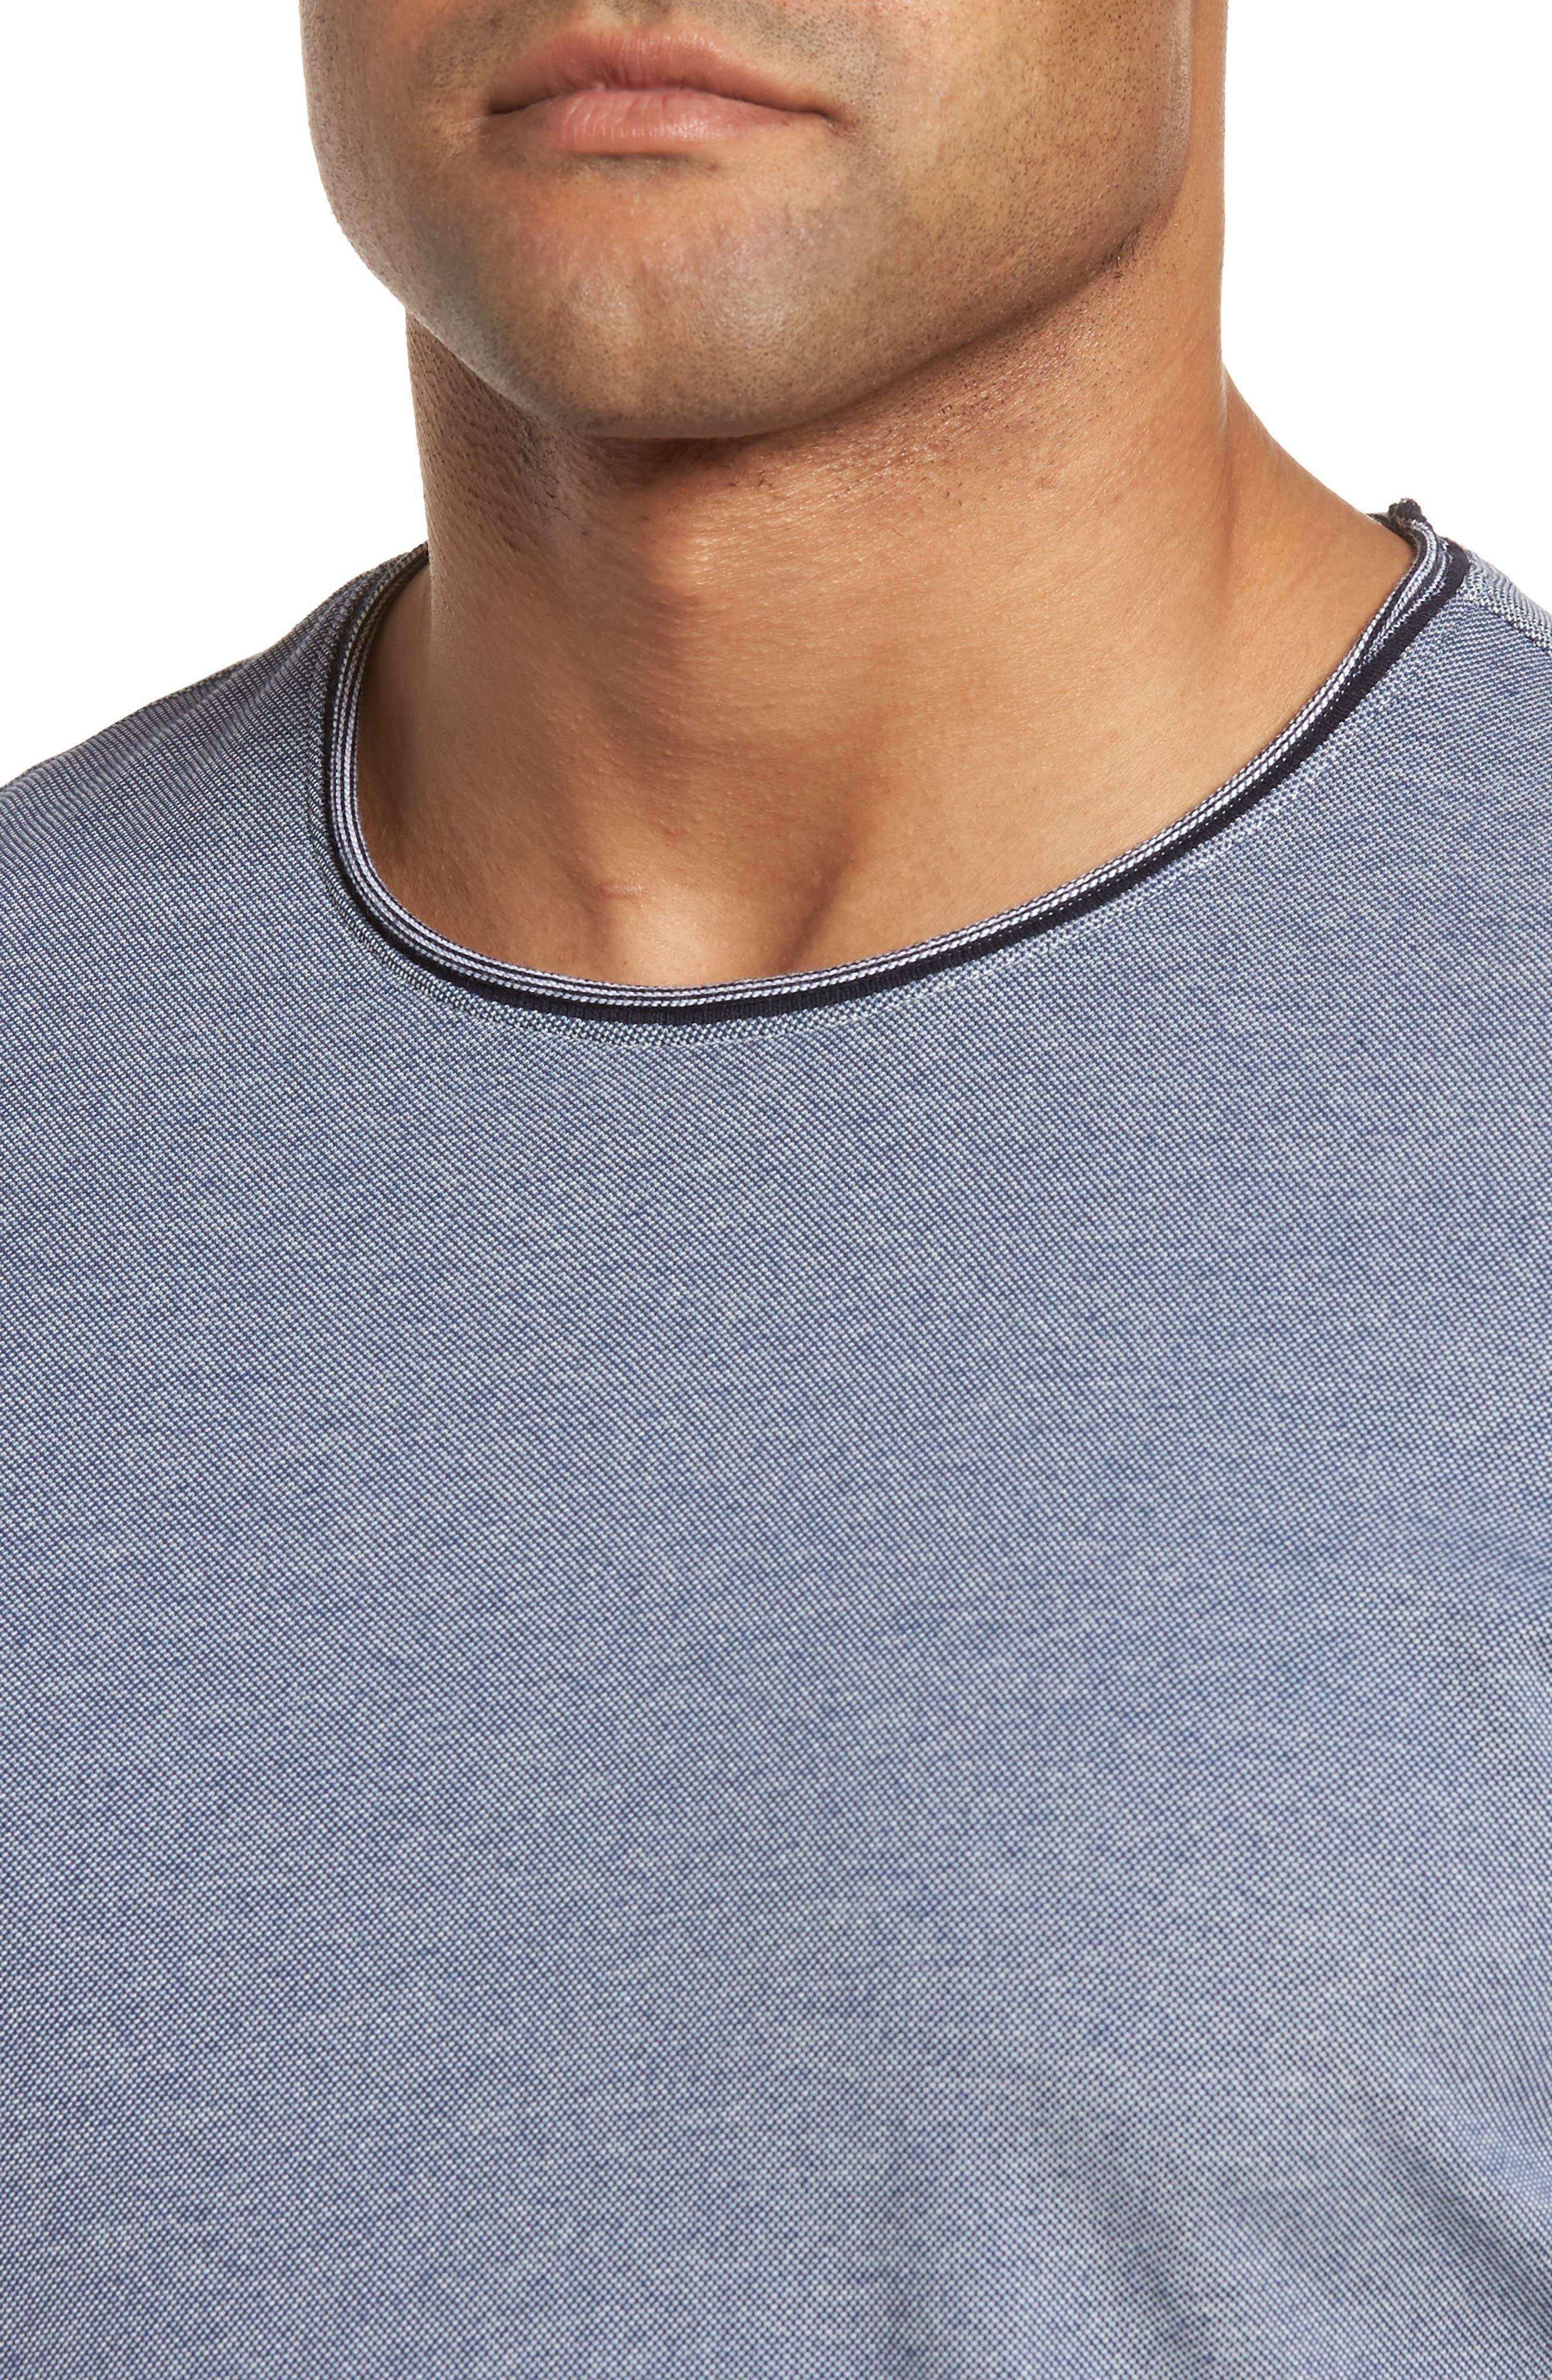 Grand Forks T-Shirt,                             Alternate thumbnail 4, color,                             410